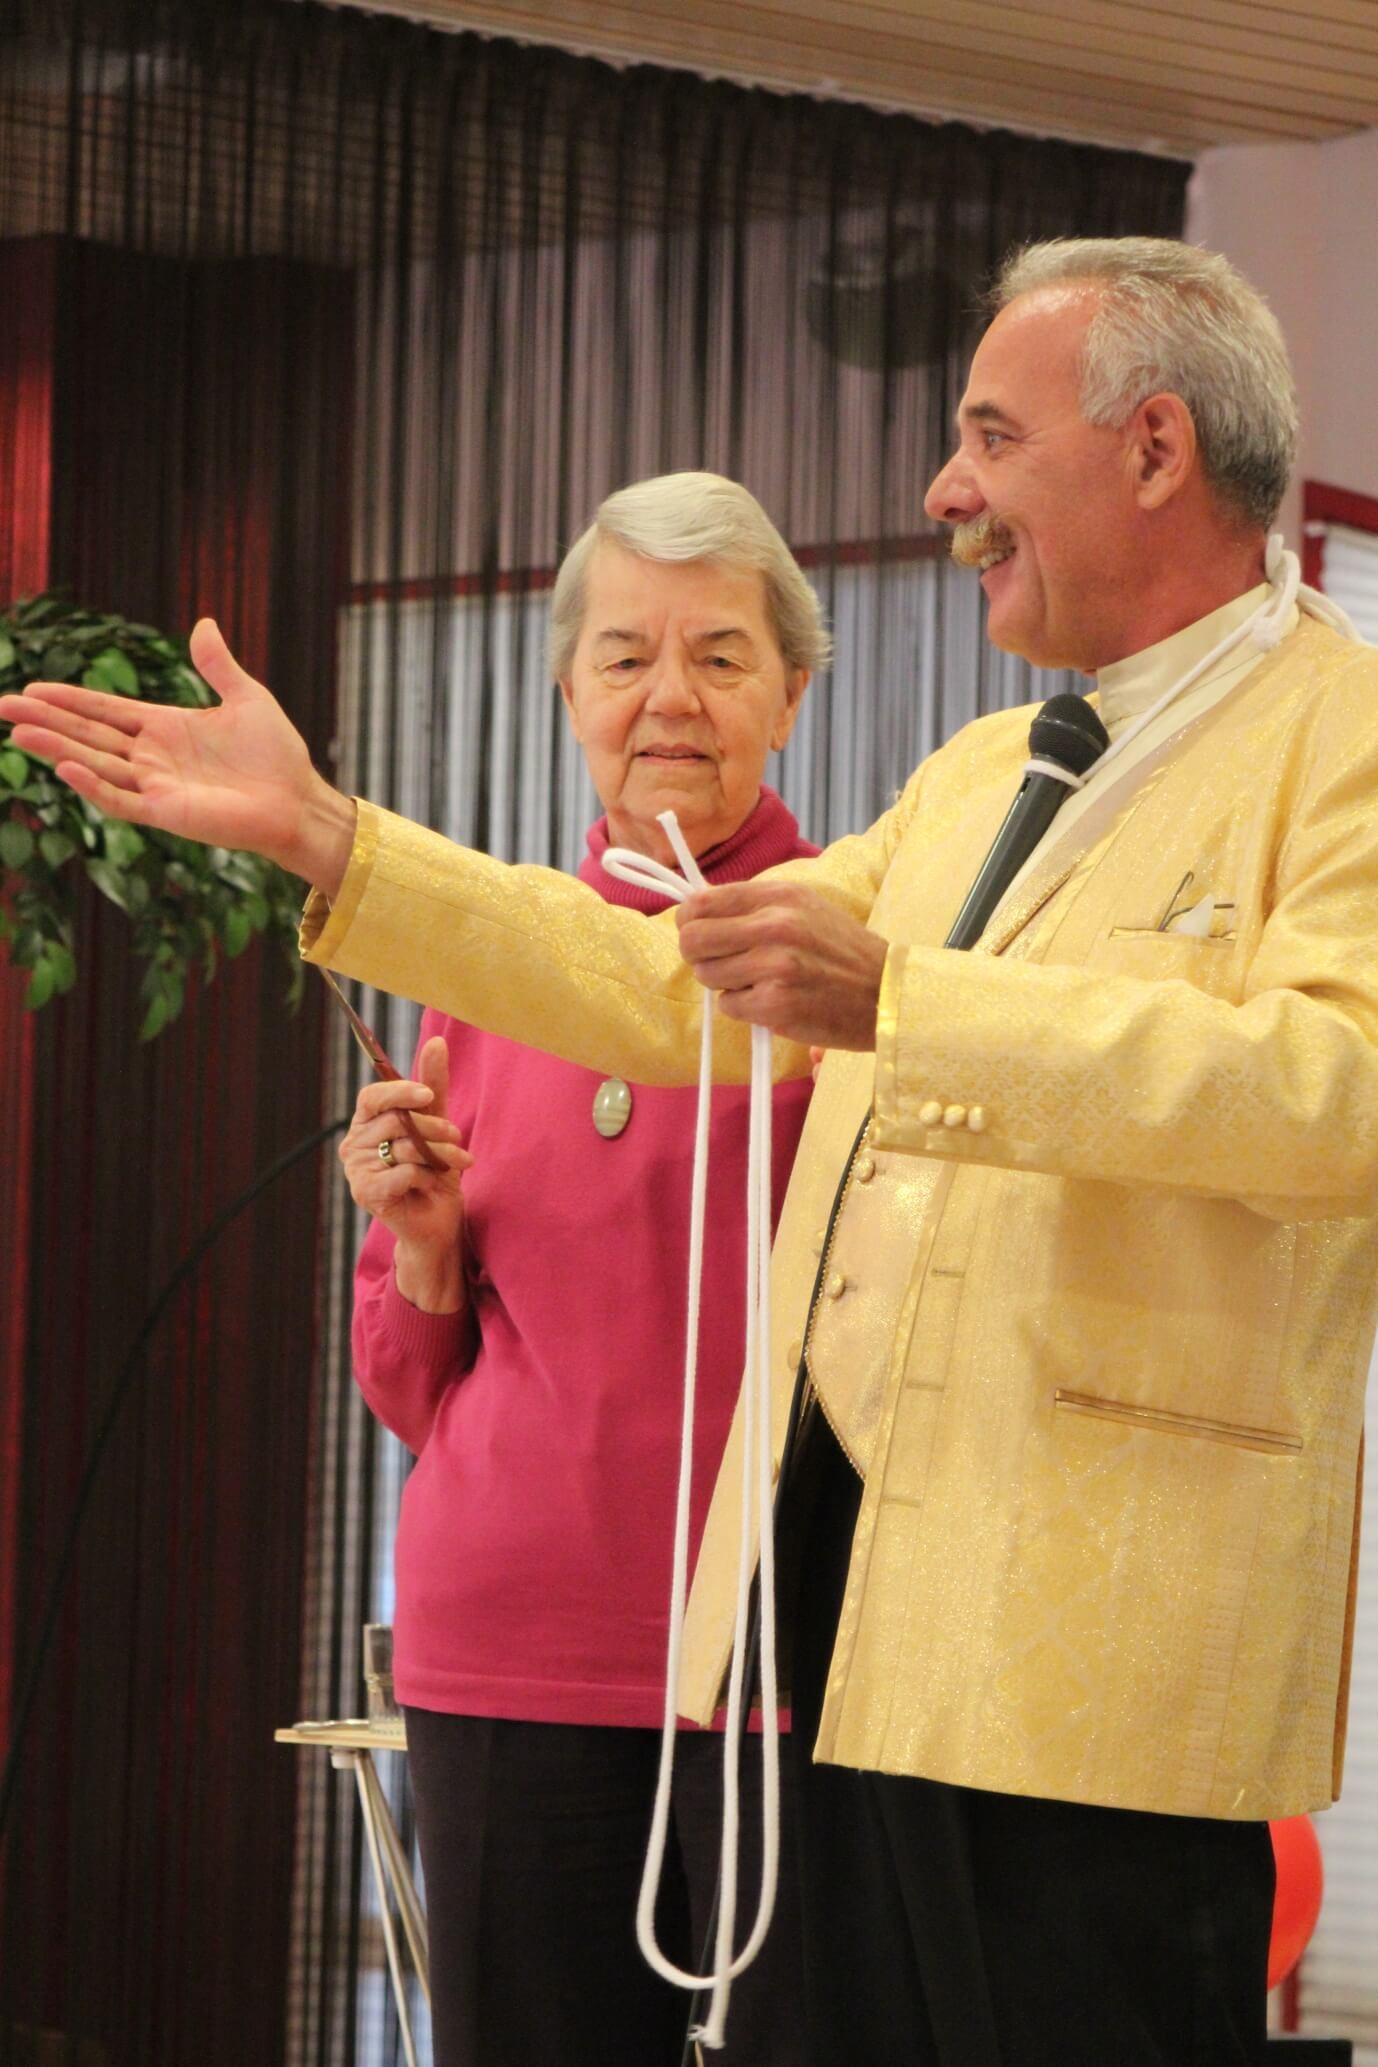 senioren goochelshow - henk romeijn